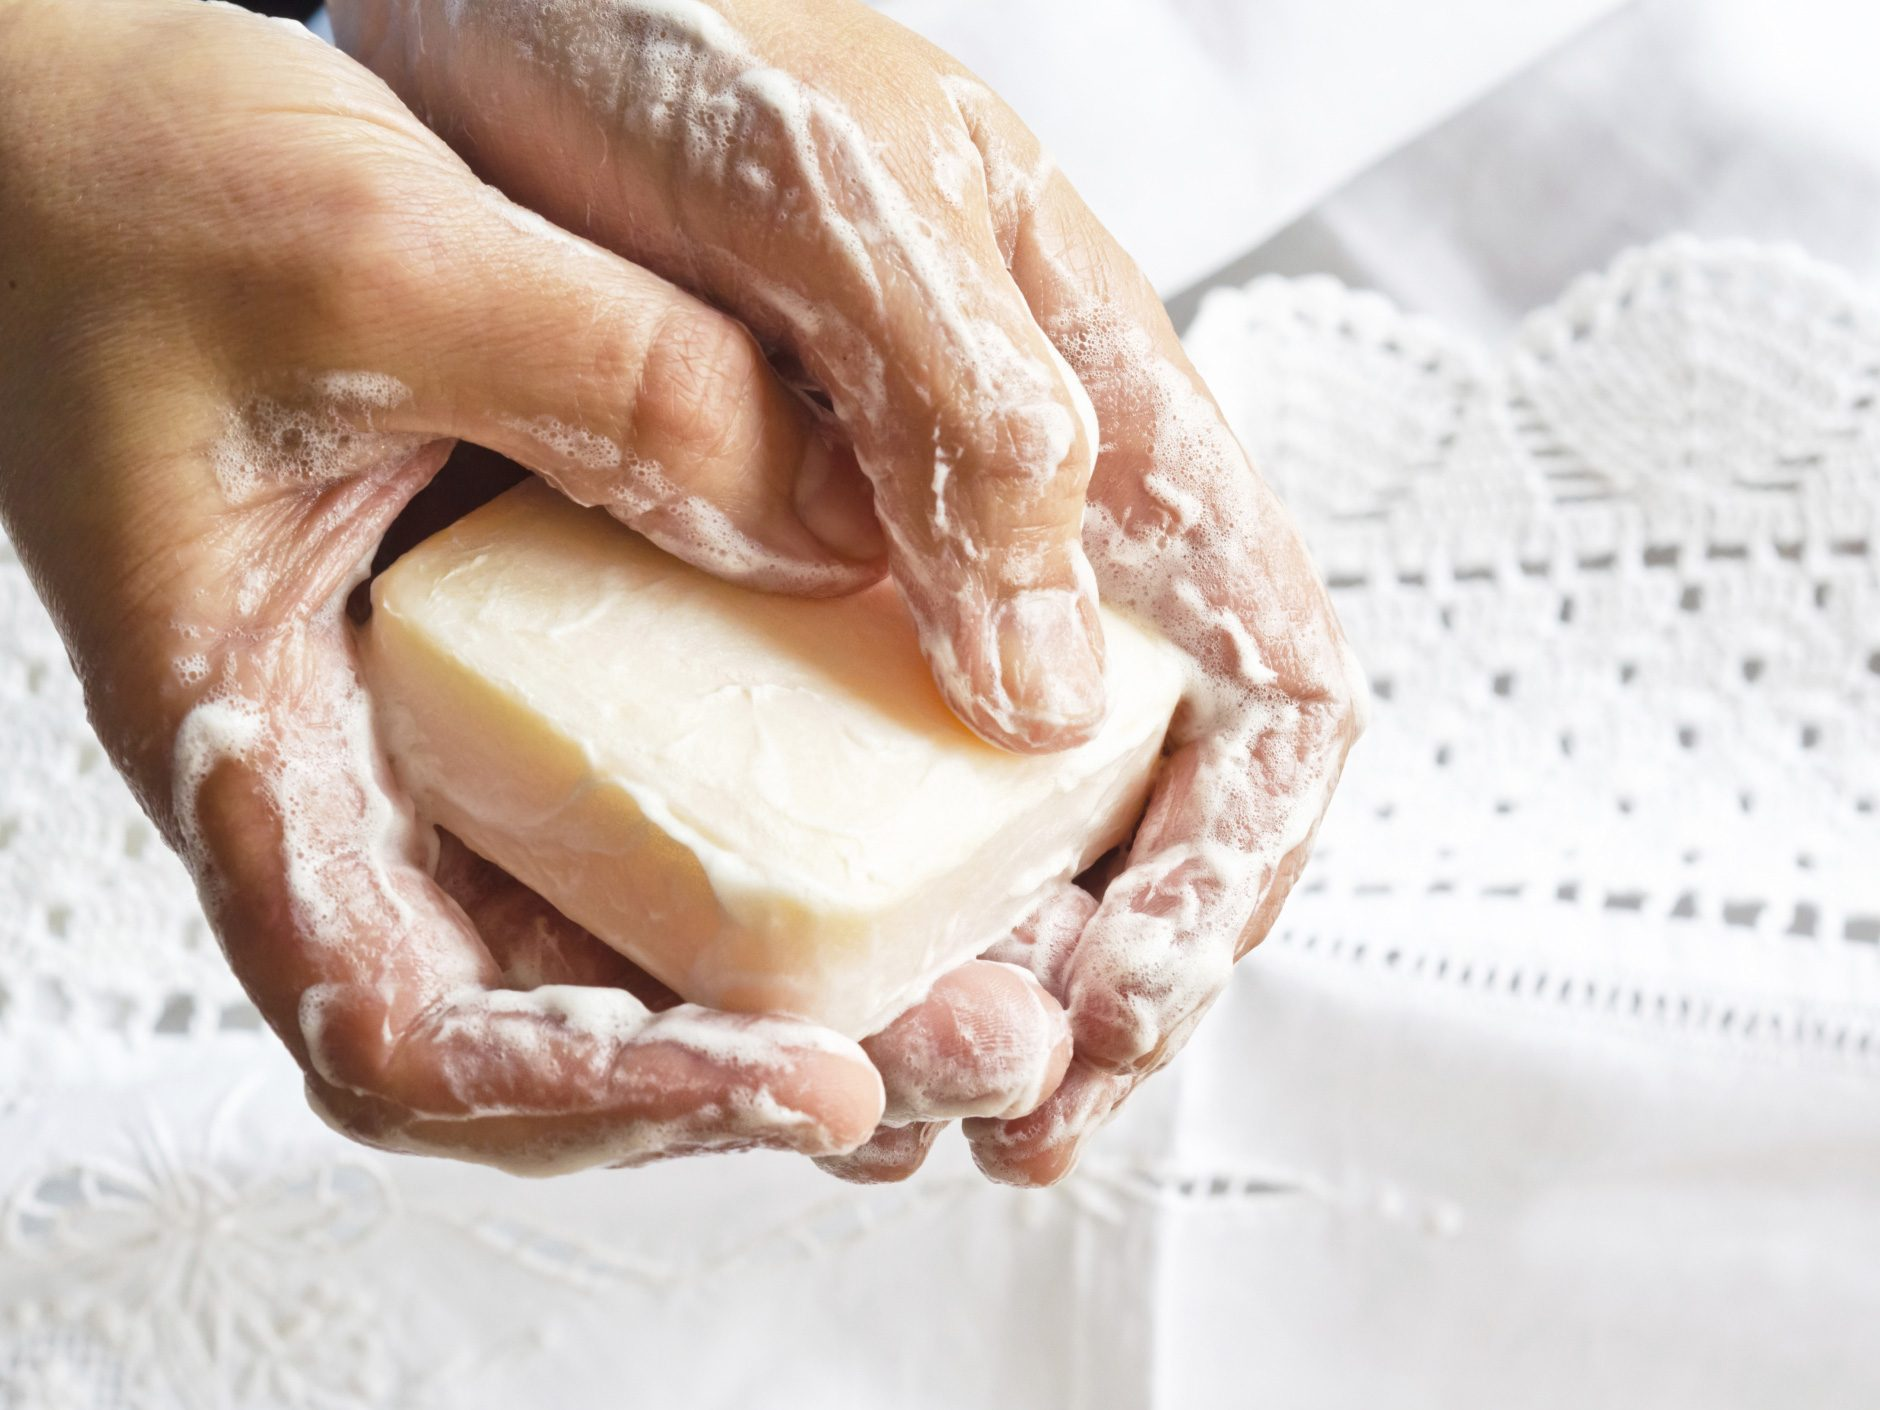 Regular Hand-Washing